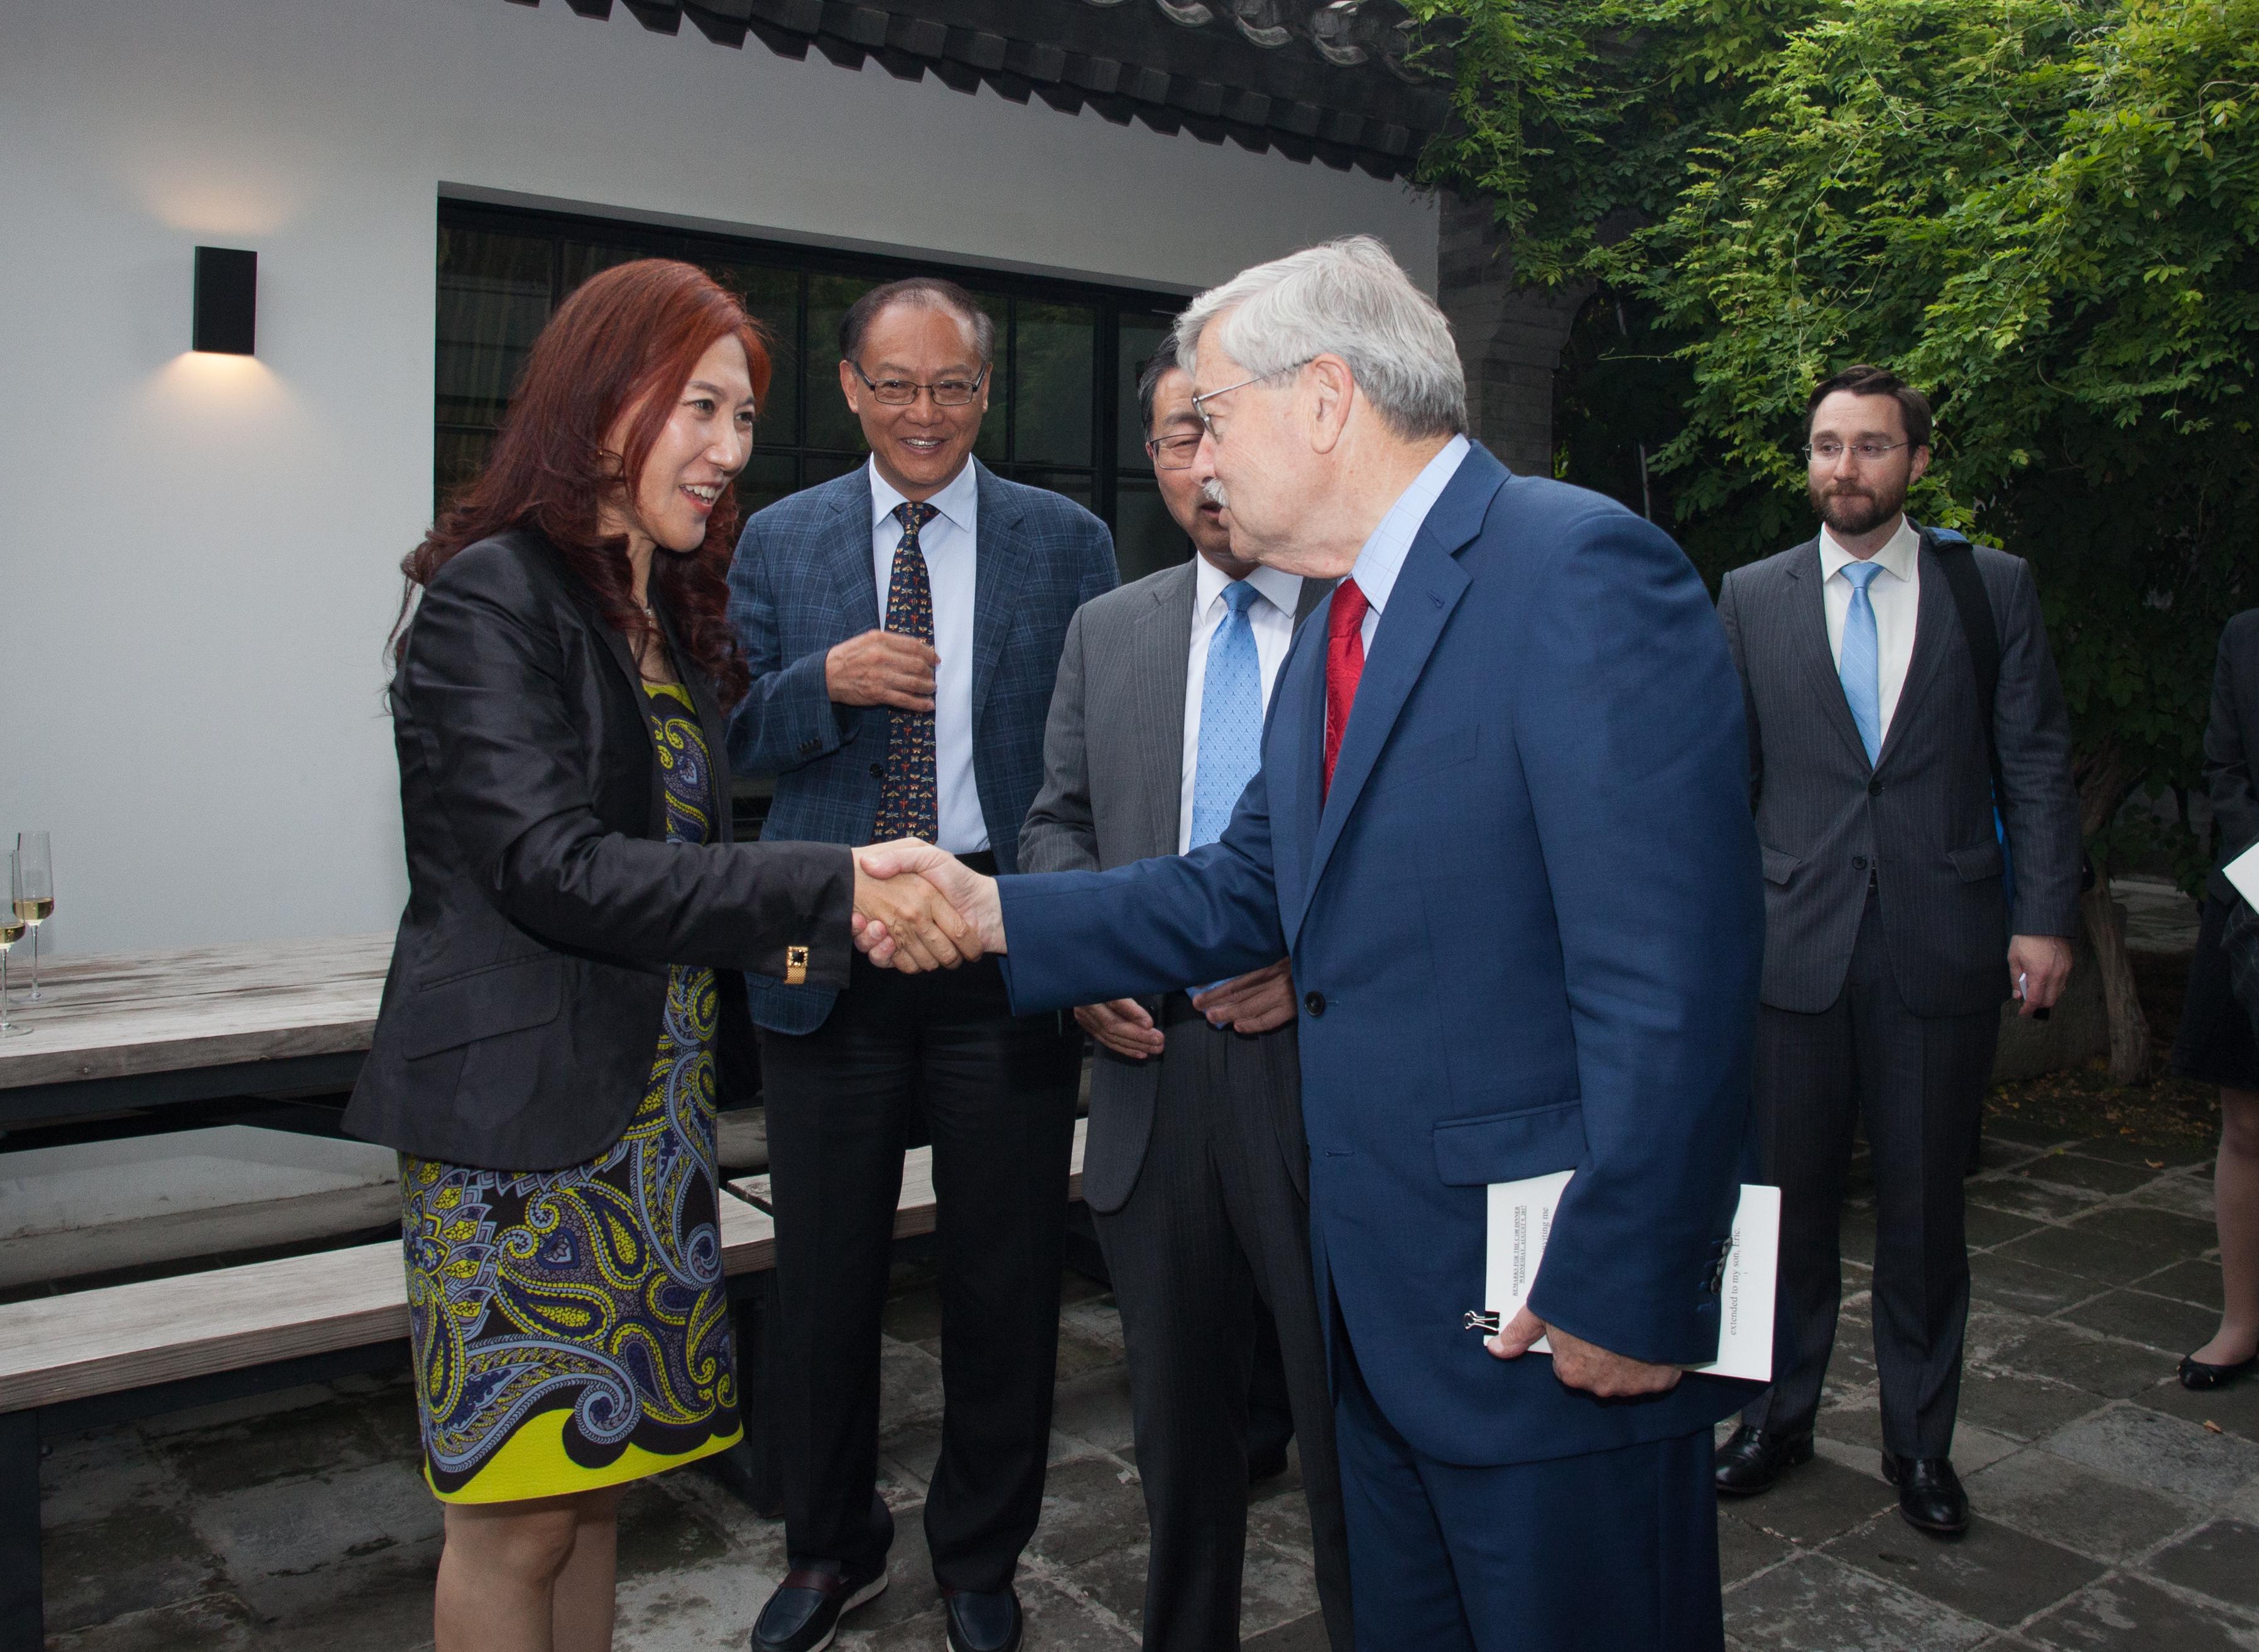 Wei Sun Christianson and Ambassador Branstad shaking hands